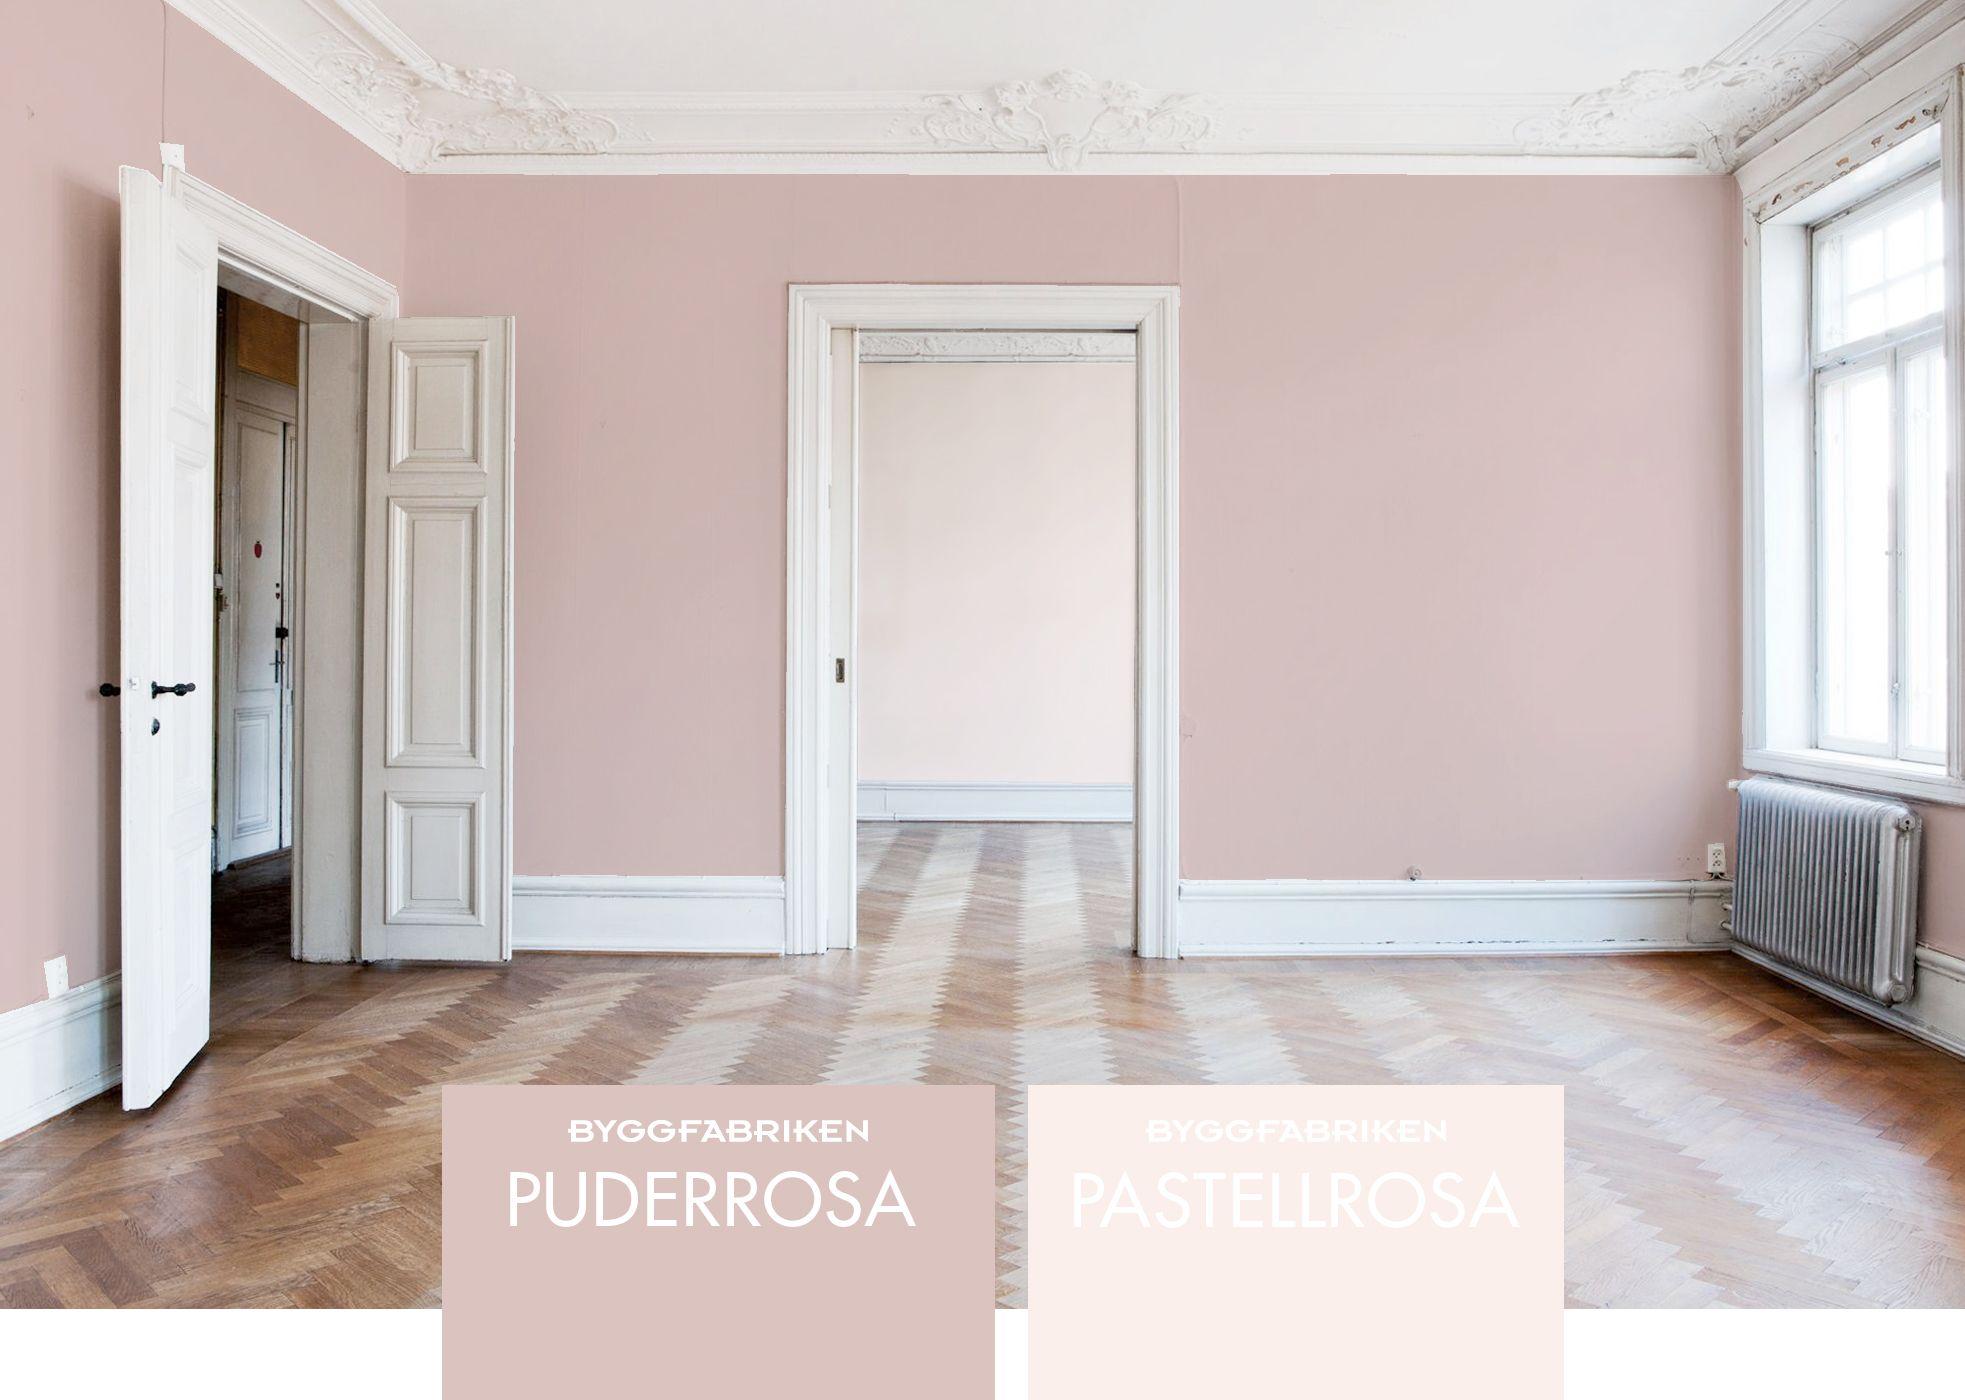 byggfabrikenkul r puderrosa pastellrosa puder design. Black Bedroom Furniture Sets. Home Design Ideas